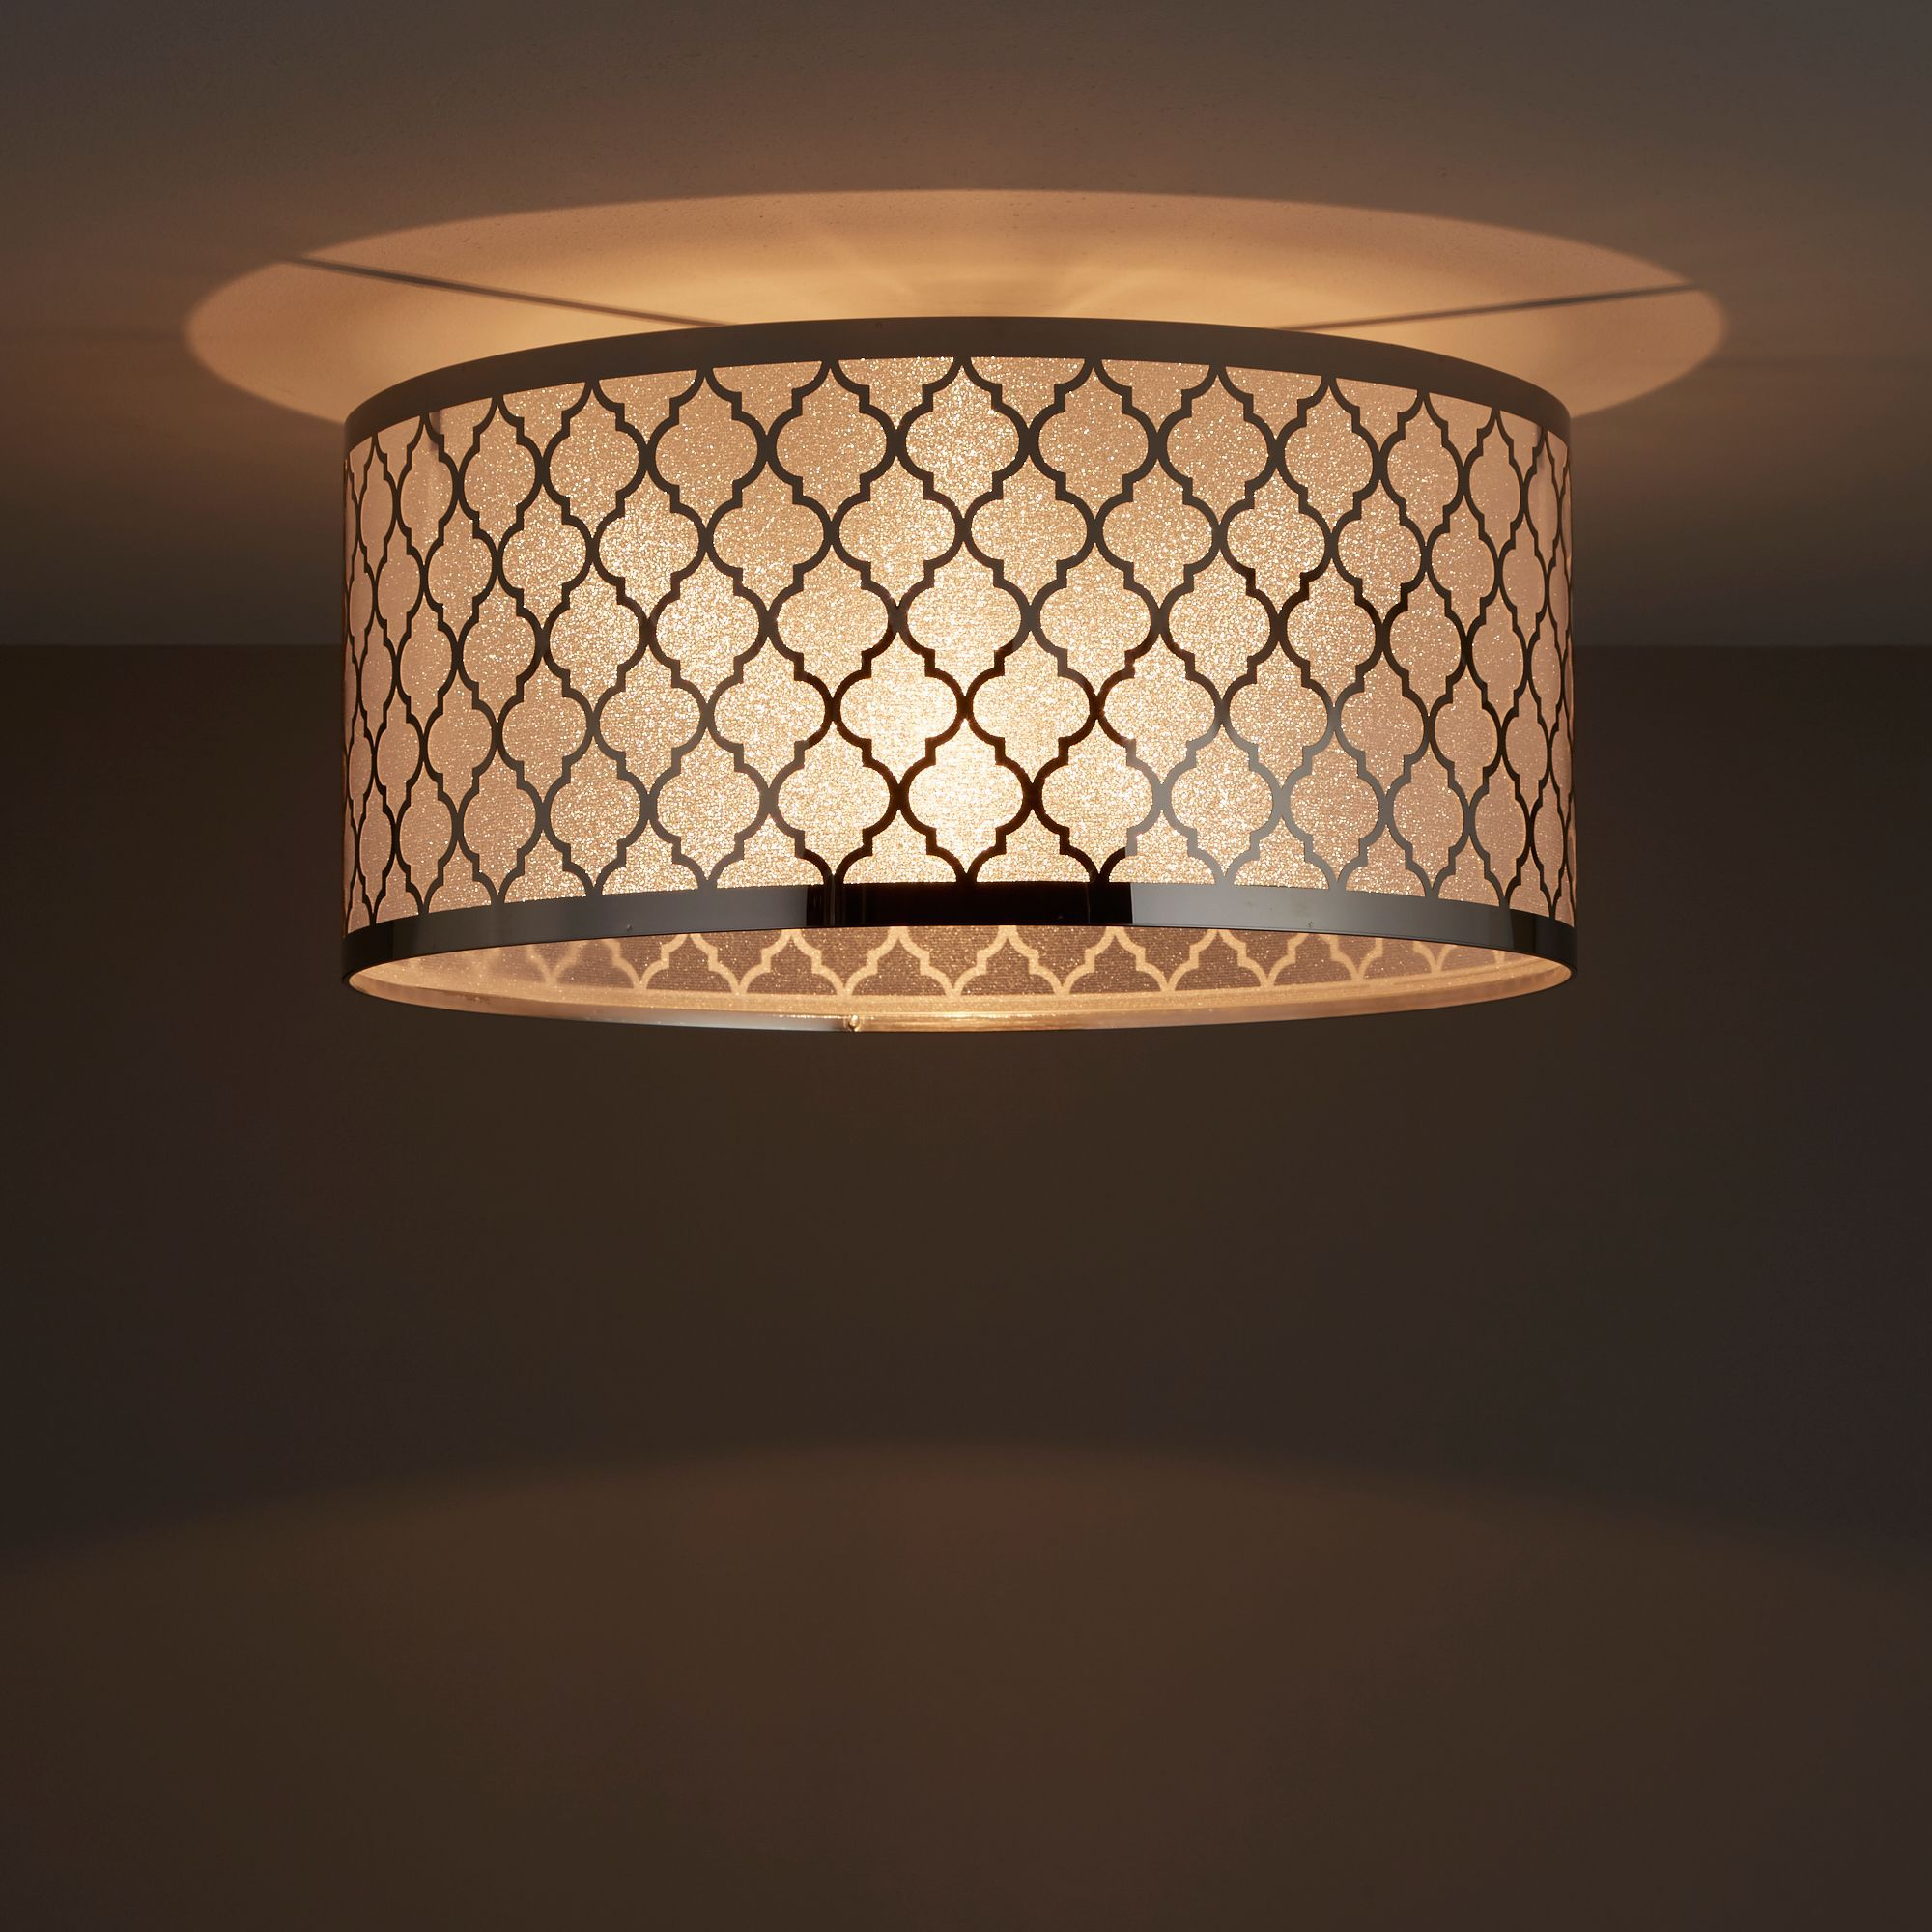 Aula Trellis Chrome effect Ceiling light